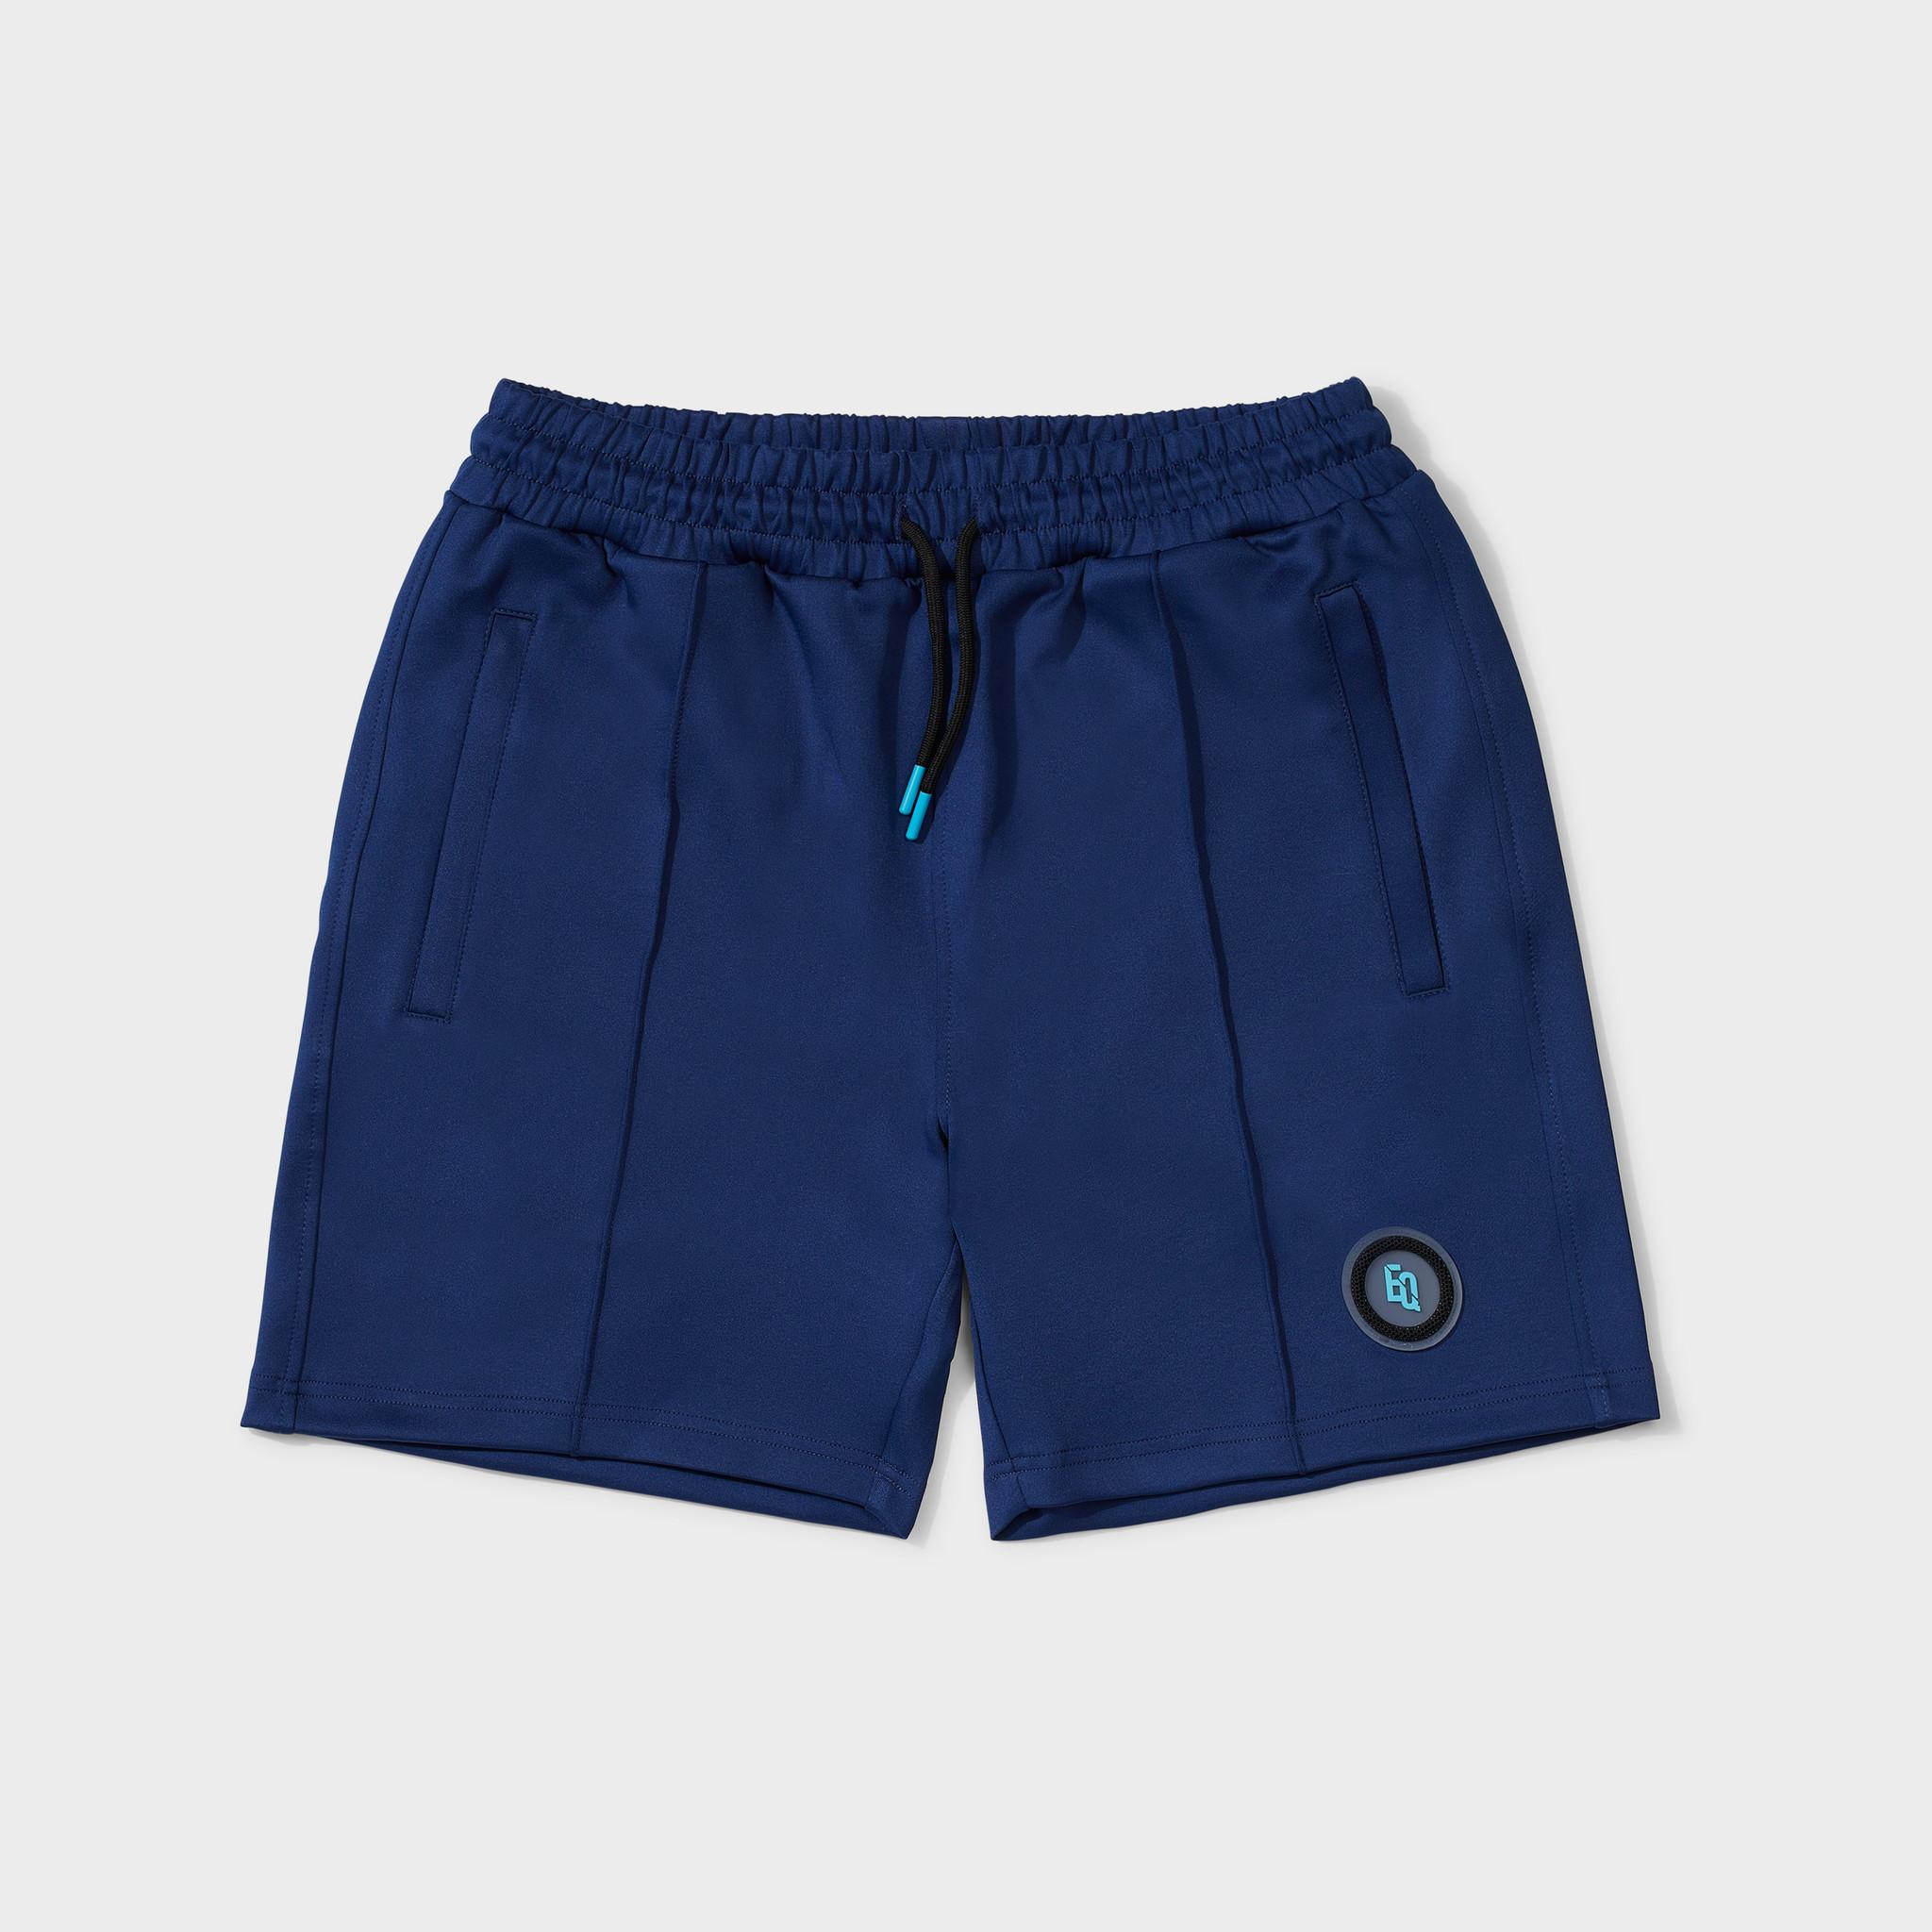 Demir carbon shorts navy-1